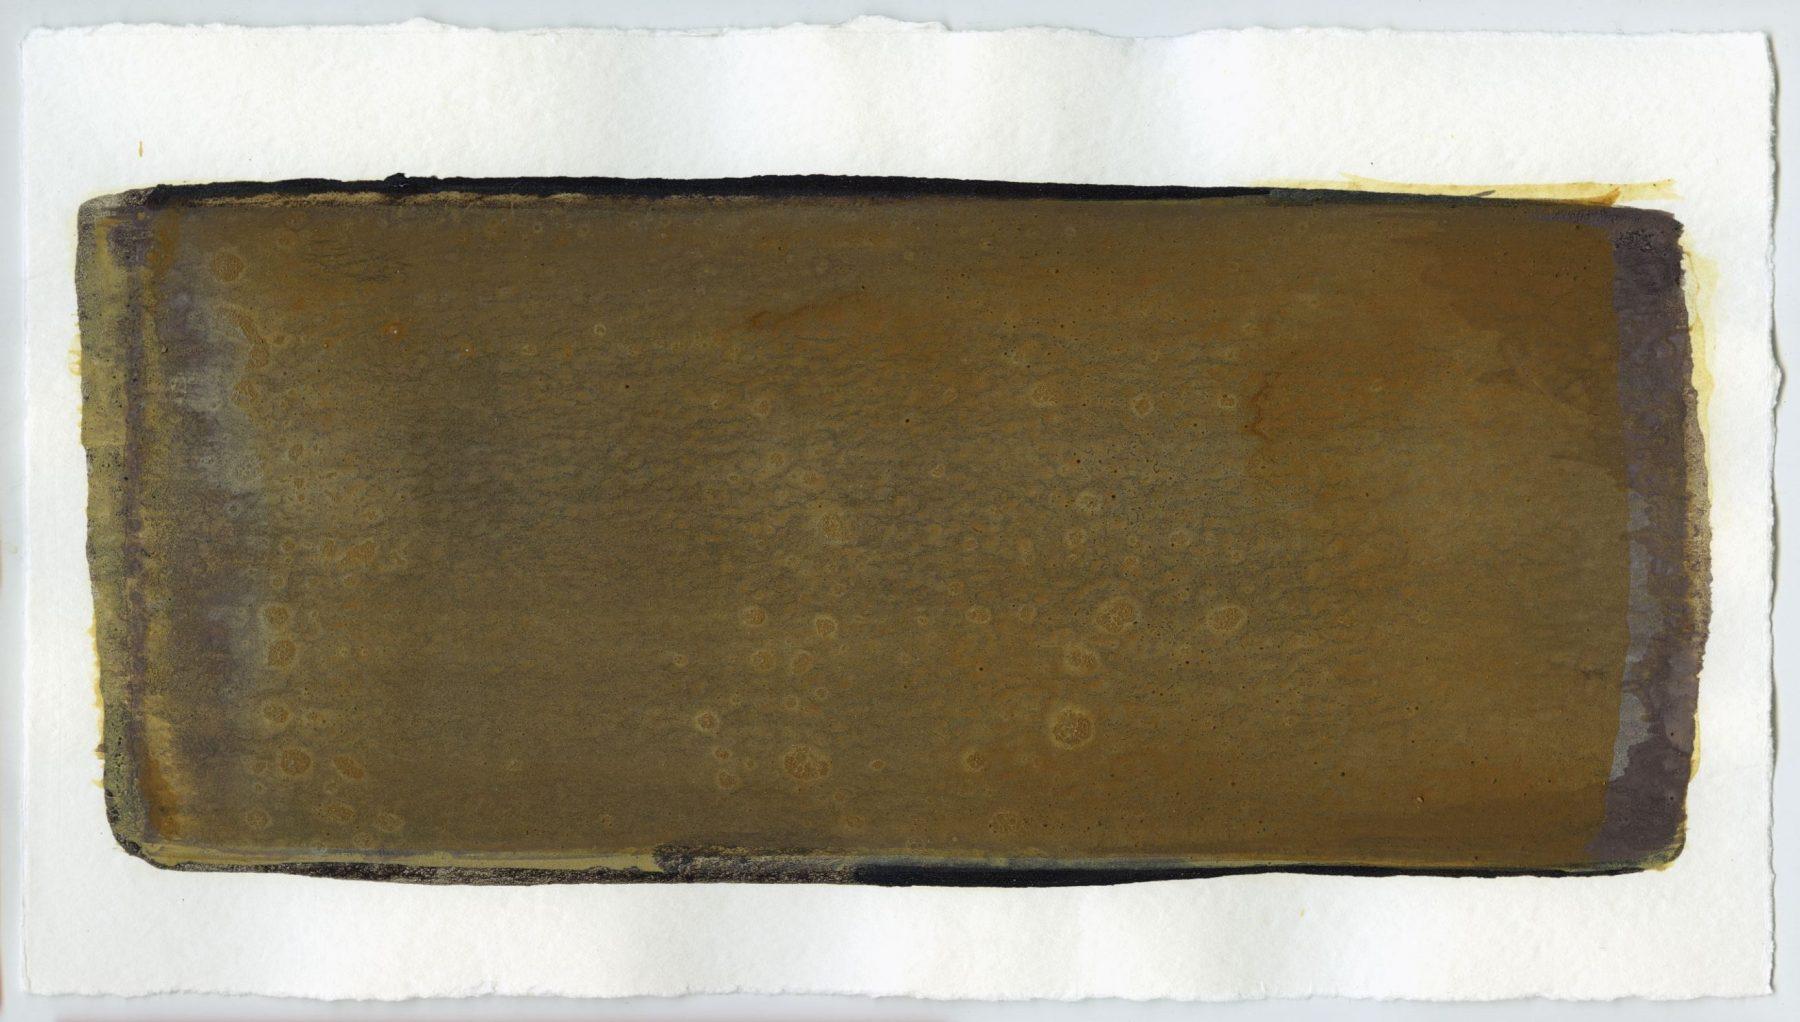 Brush stroke no. 22 - Selfmade pigment: Slingerpad bruin, Mortelse oker, Mortel paarsgrijs fijn, Mortelse goudoker